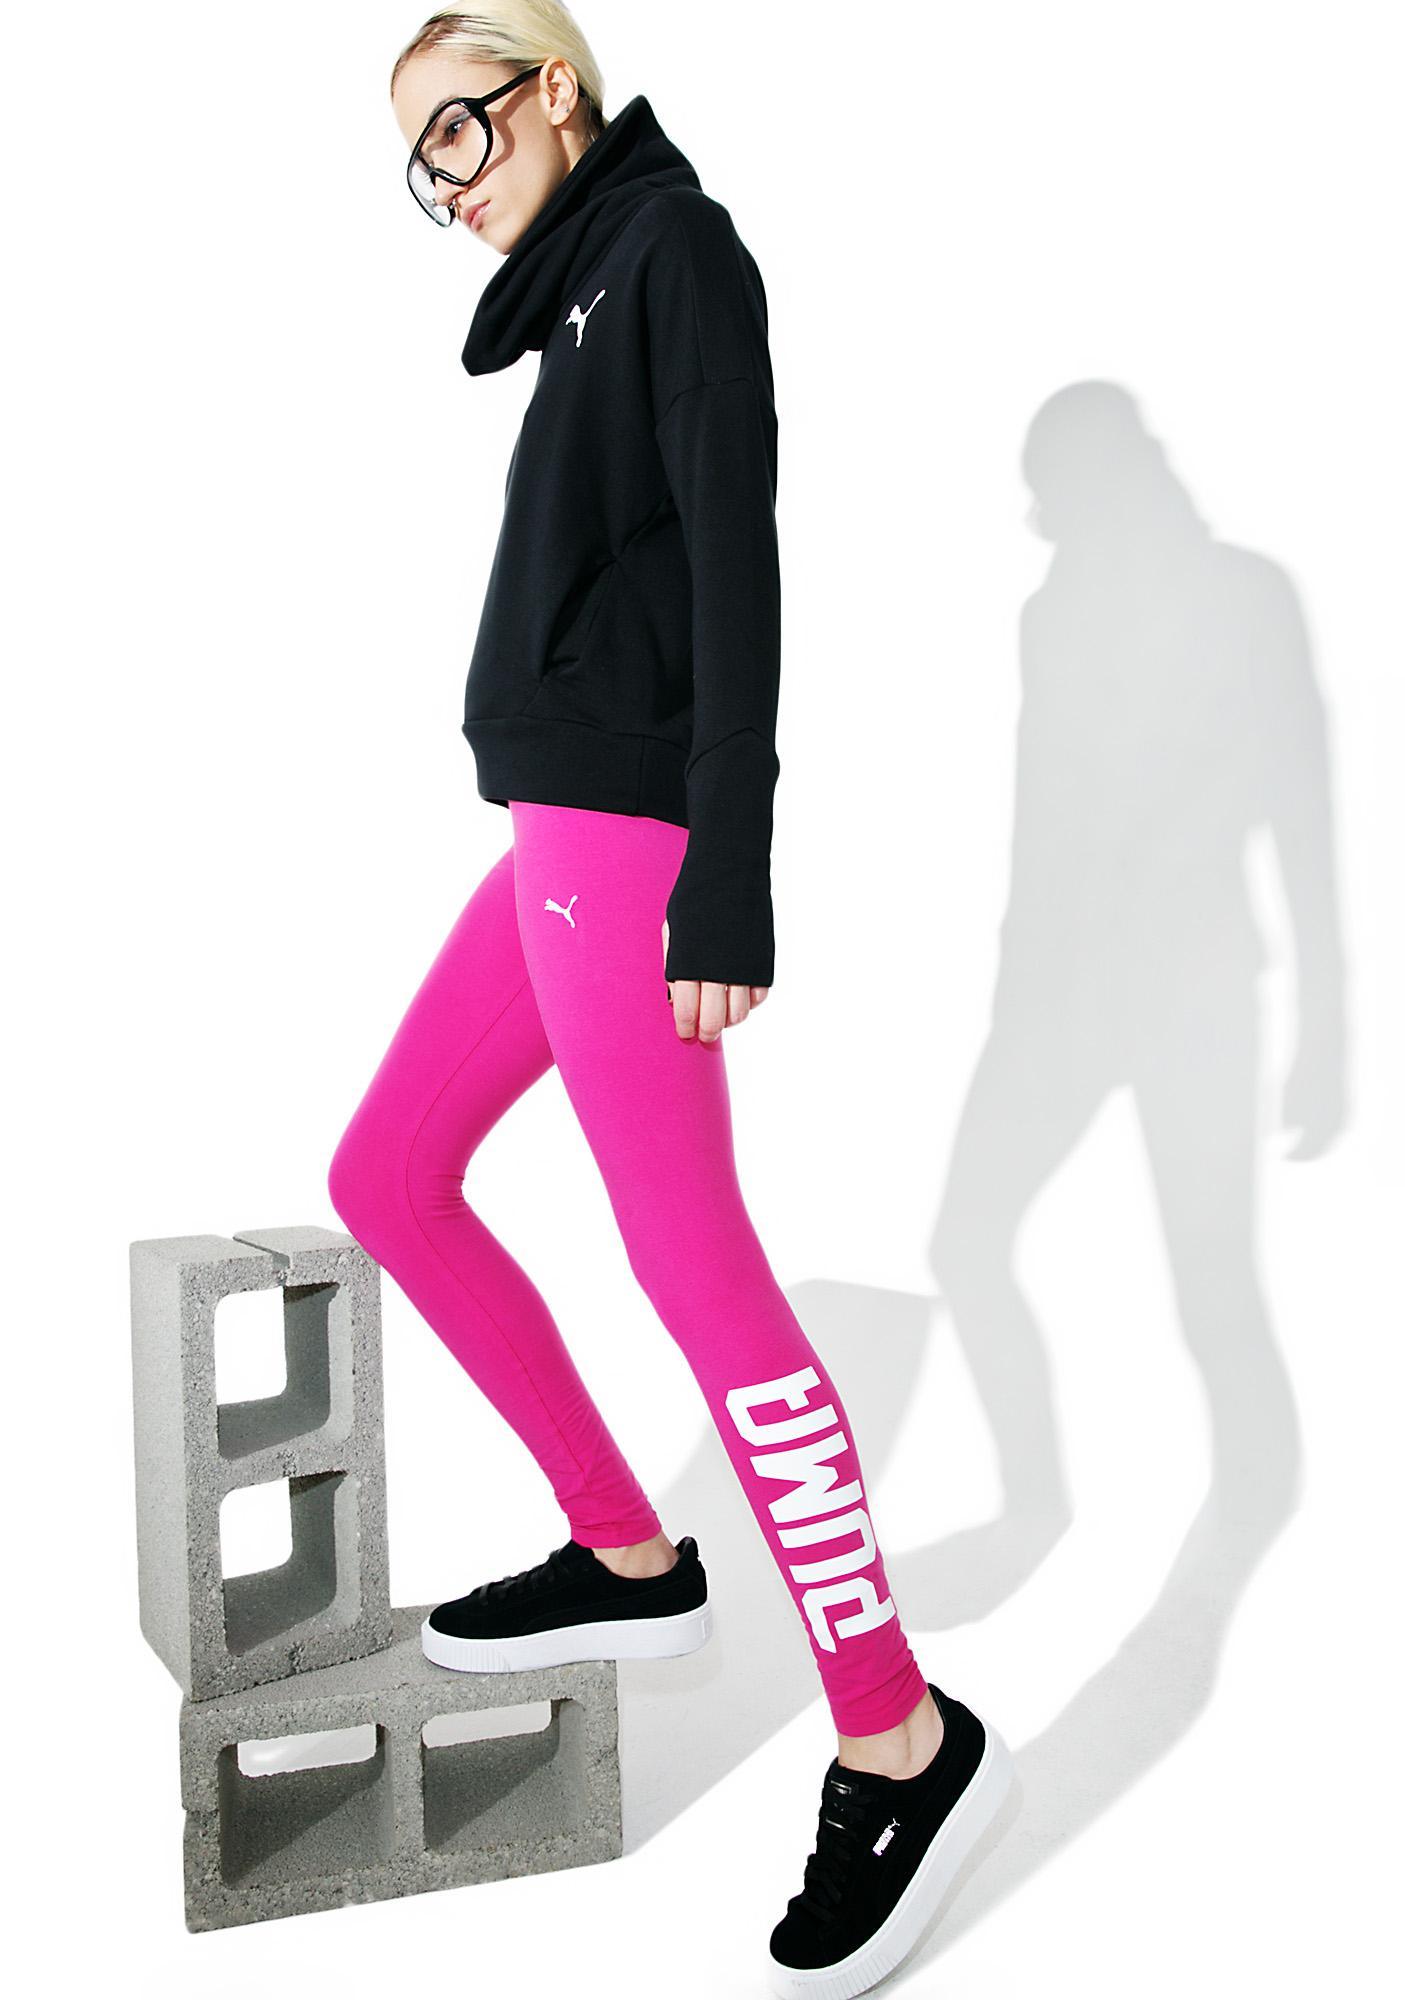 PUMA Style Swagger Leggings